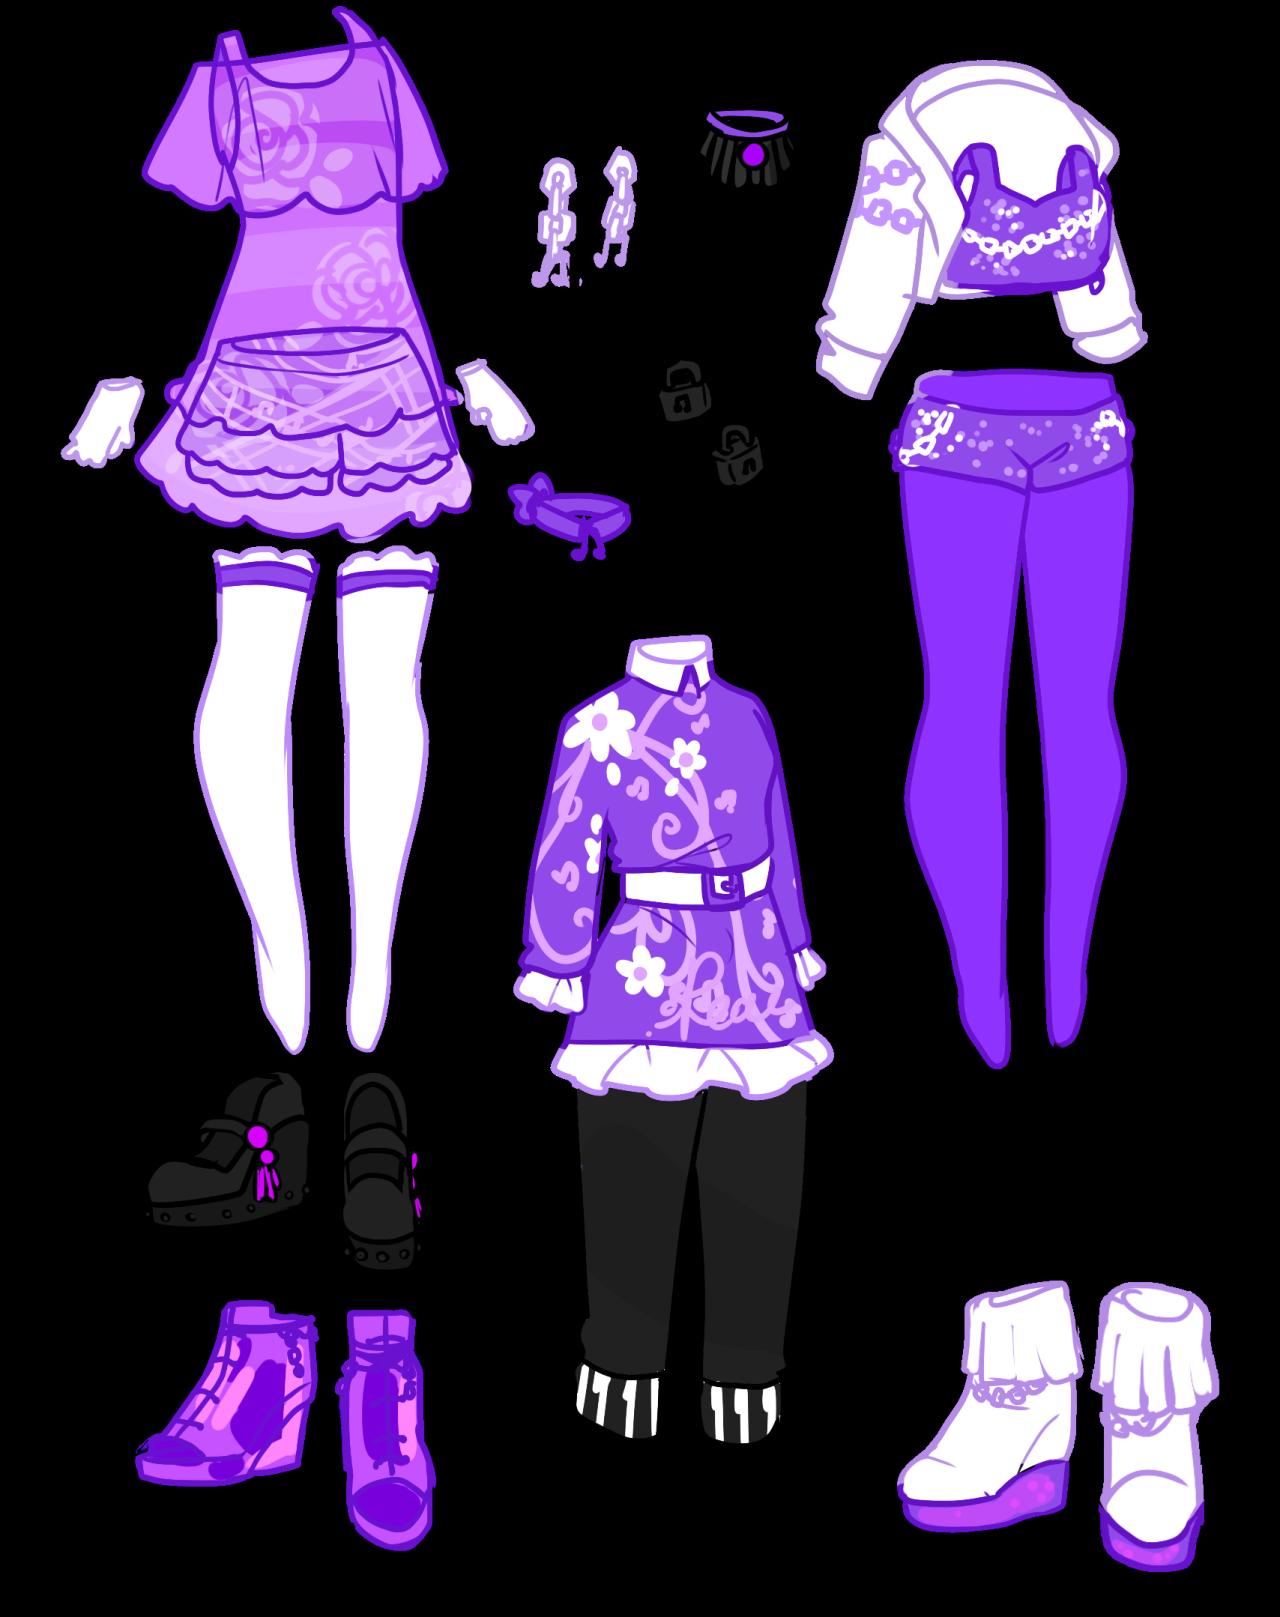 Deer S Tears Fashion Design Drawings Fashion Design Sketches Kawaii Clothes